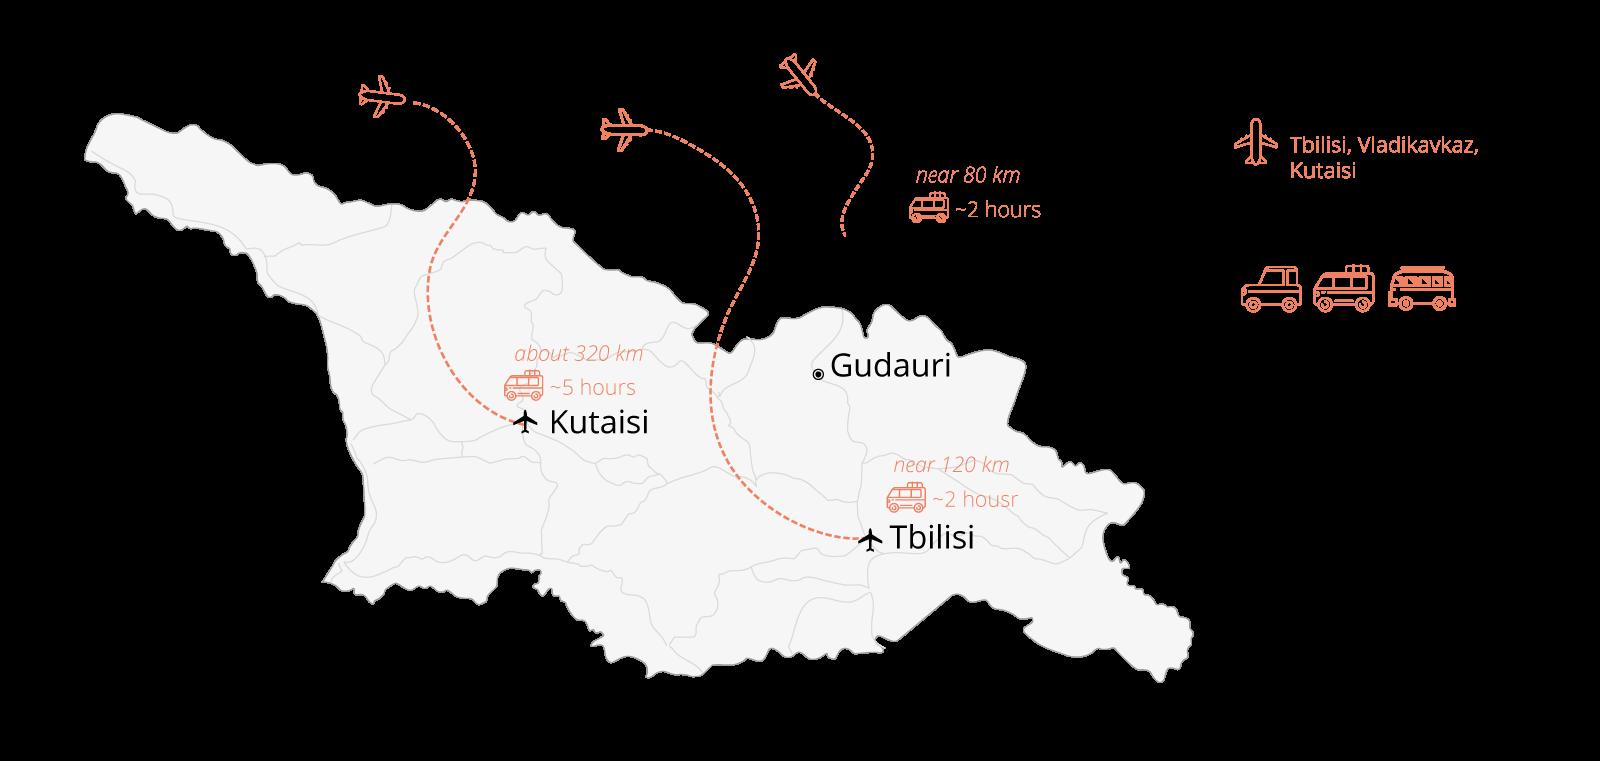 Transfer to Gudauri transfer to Tbilisi airport Vladikavkaz and